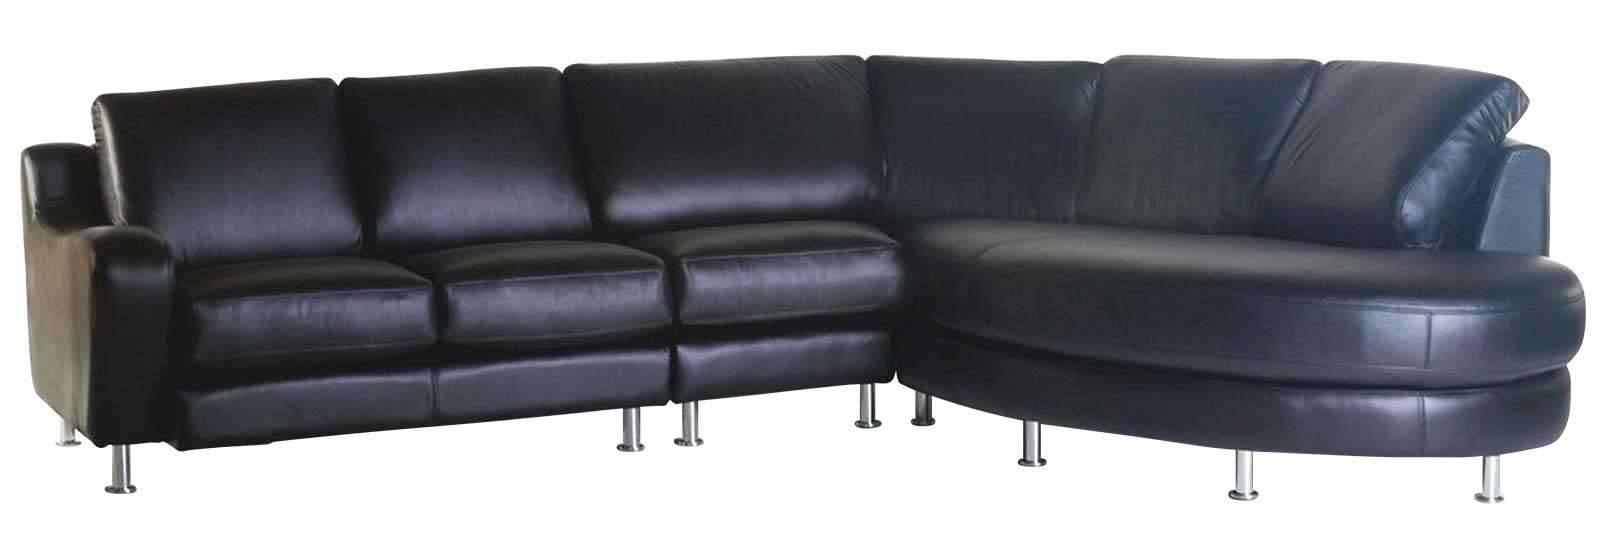 Sofas Center : Contemporary Leather Sofa Modern Furniture throughout Modern Sofas Houston (Image 24 of 30)